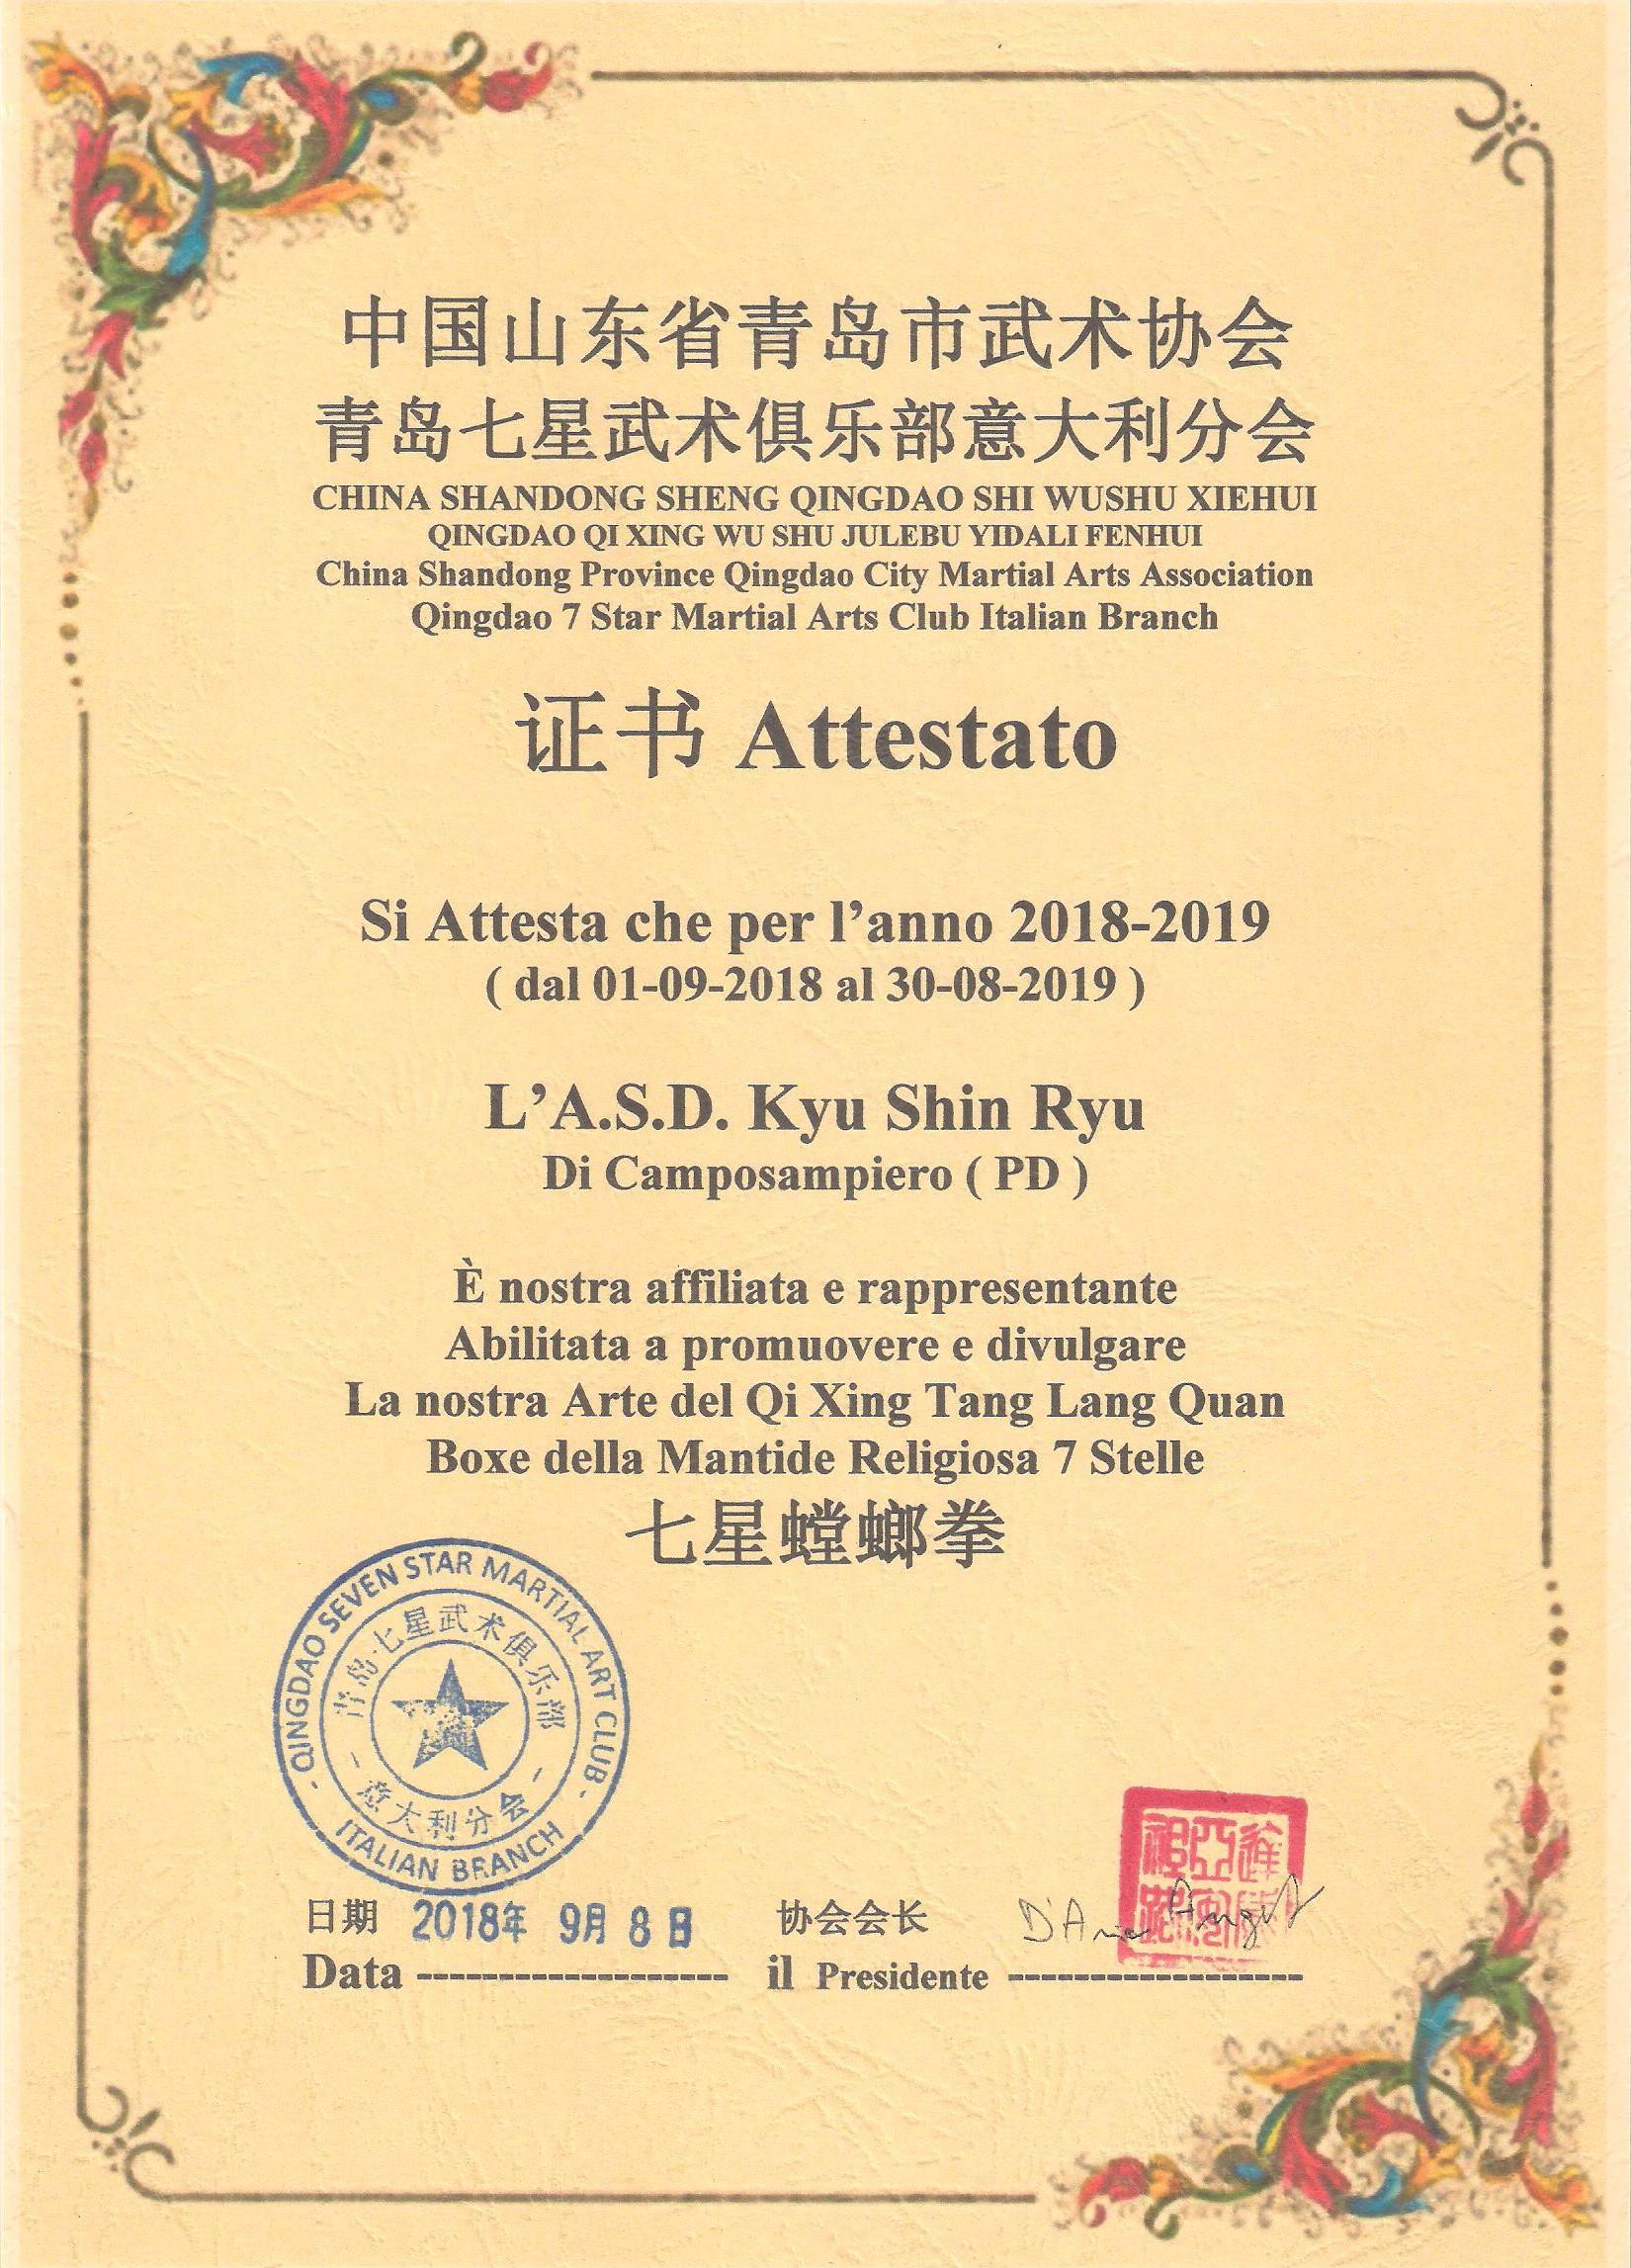 attestato_qingdao_2018_2019